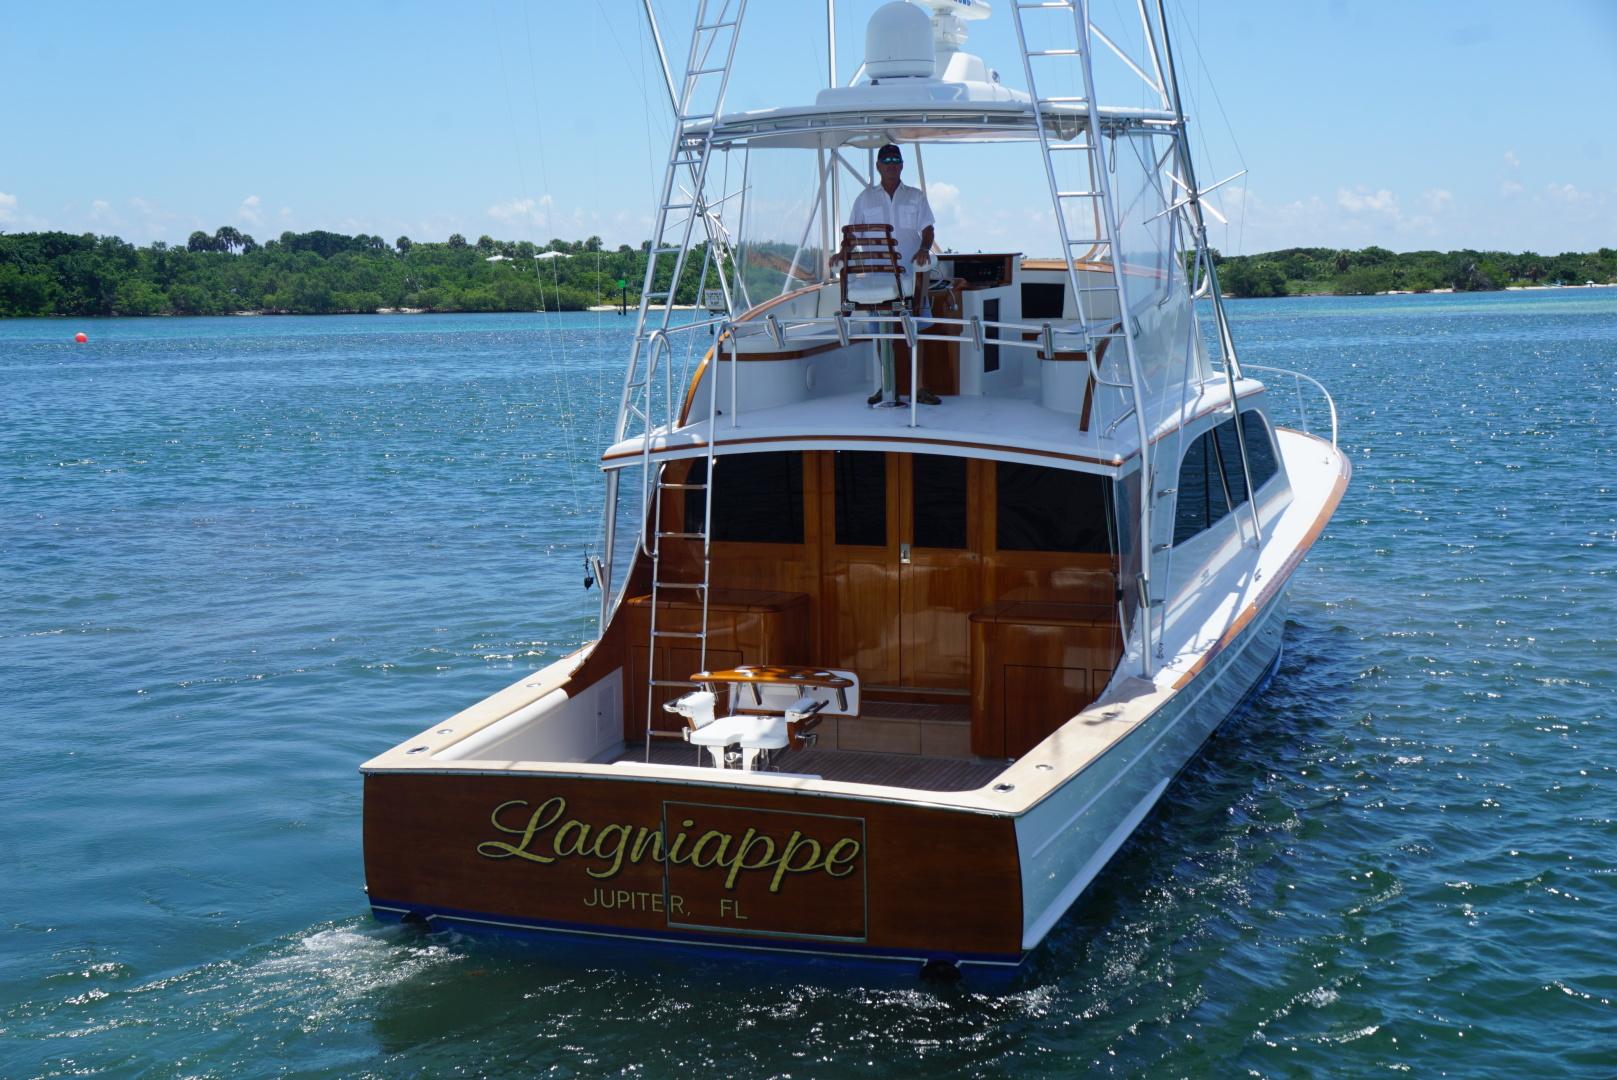 Merritt-Custom 1977-Lagniappe Jupiter-Florida-United States-1554033 | Thumbnail